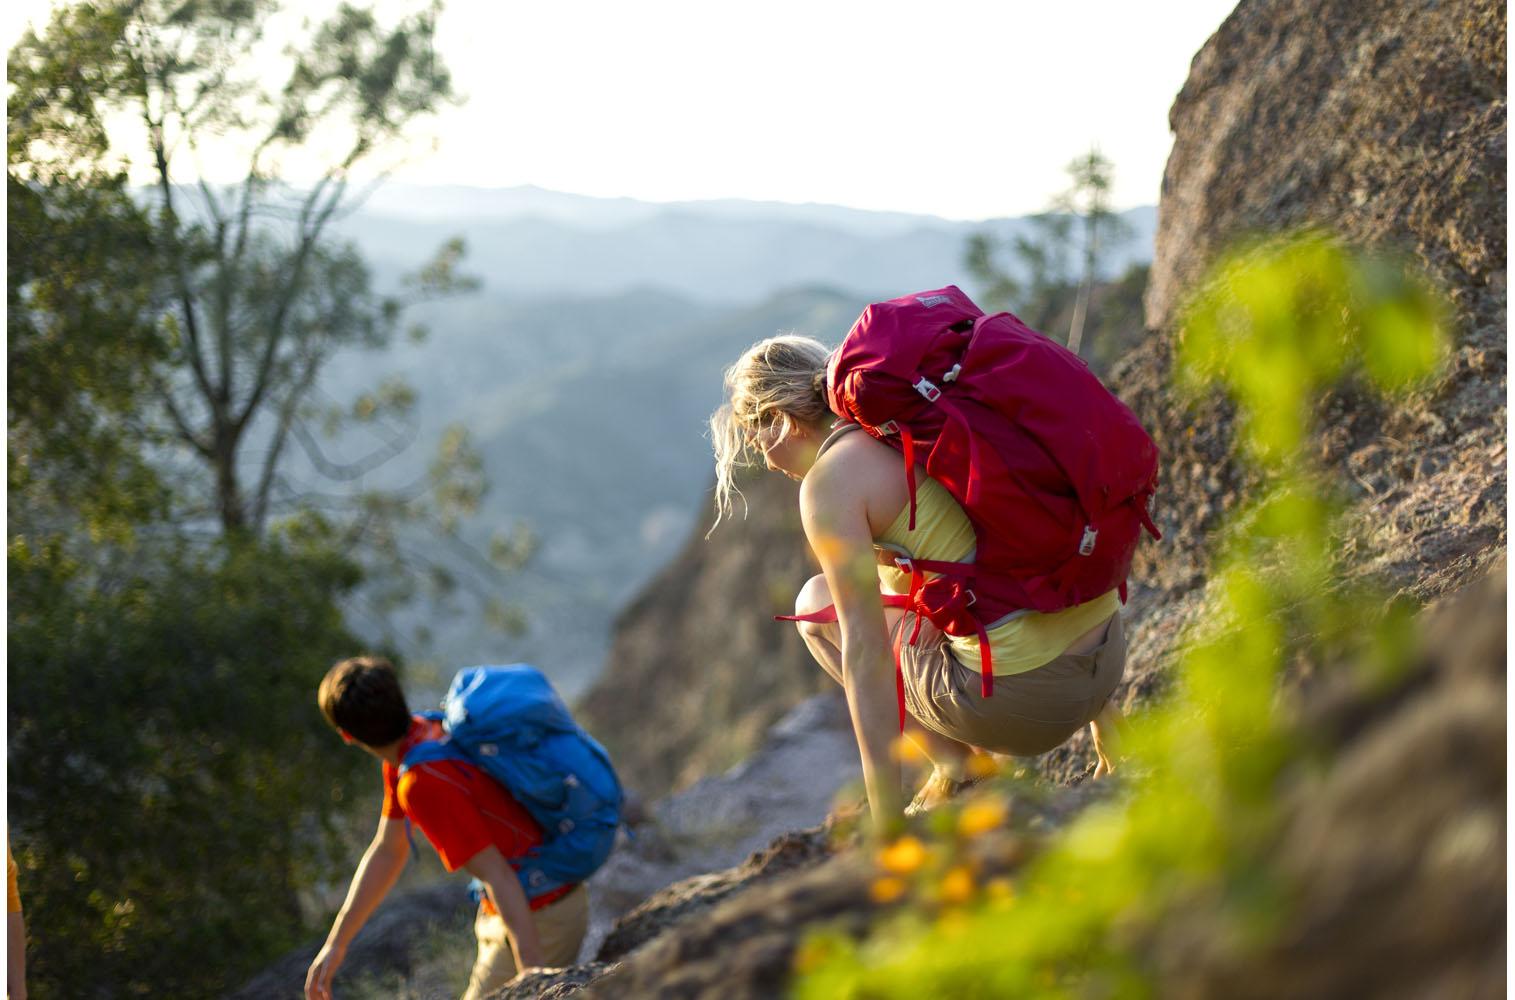 Lifestyle: Three friends on a hiking road trip through the Big Sur coast, California